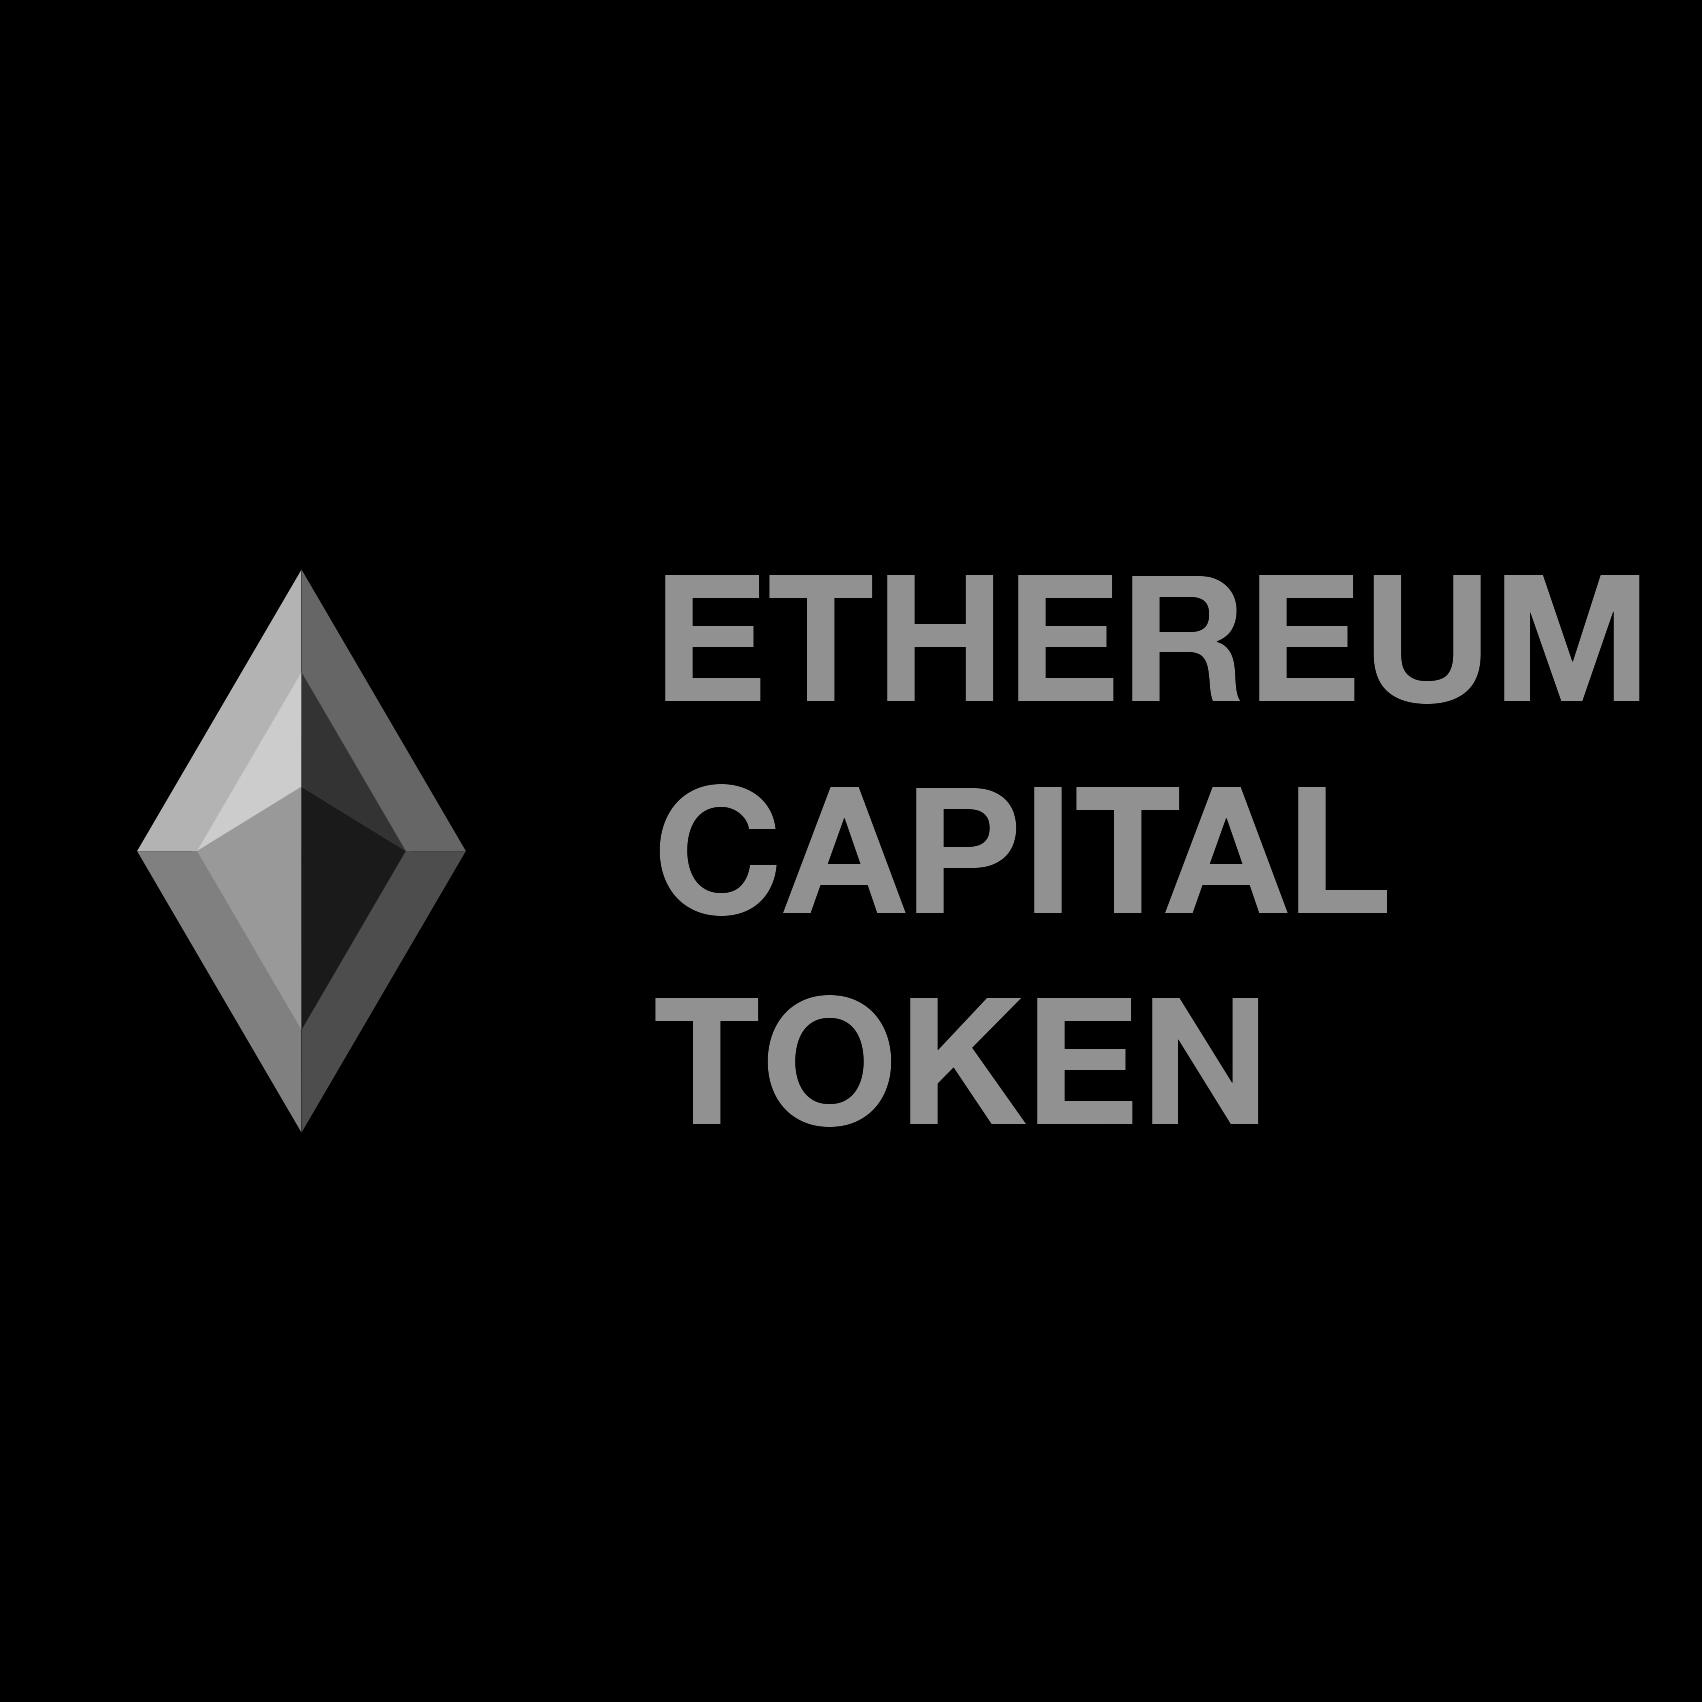 Ethereum Capital Token logo